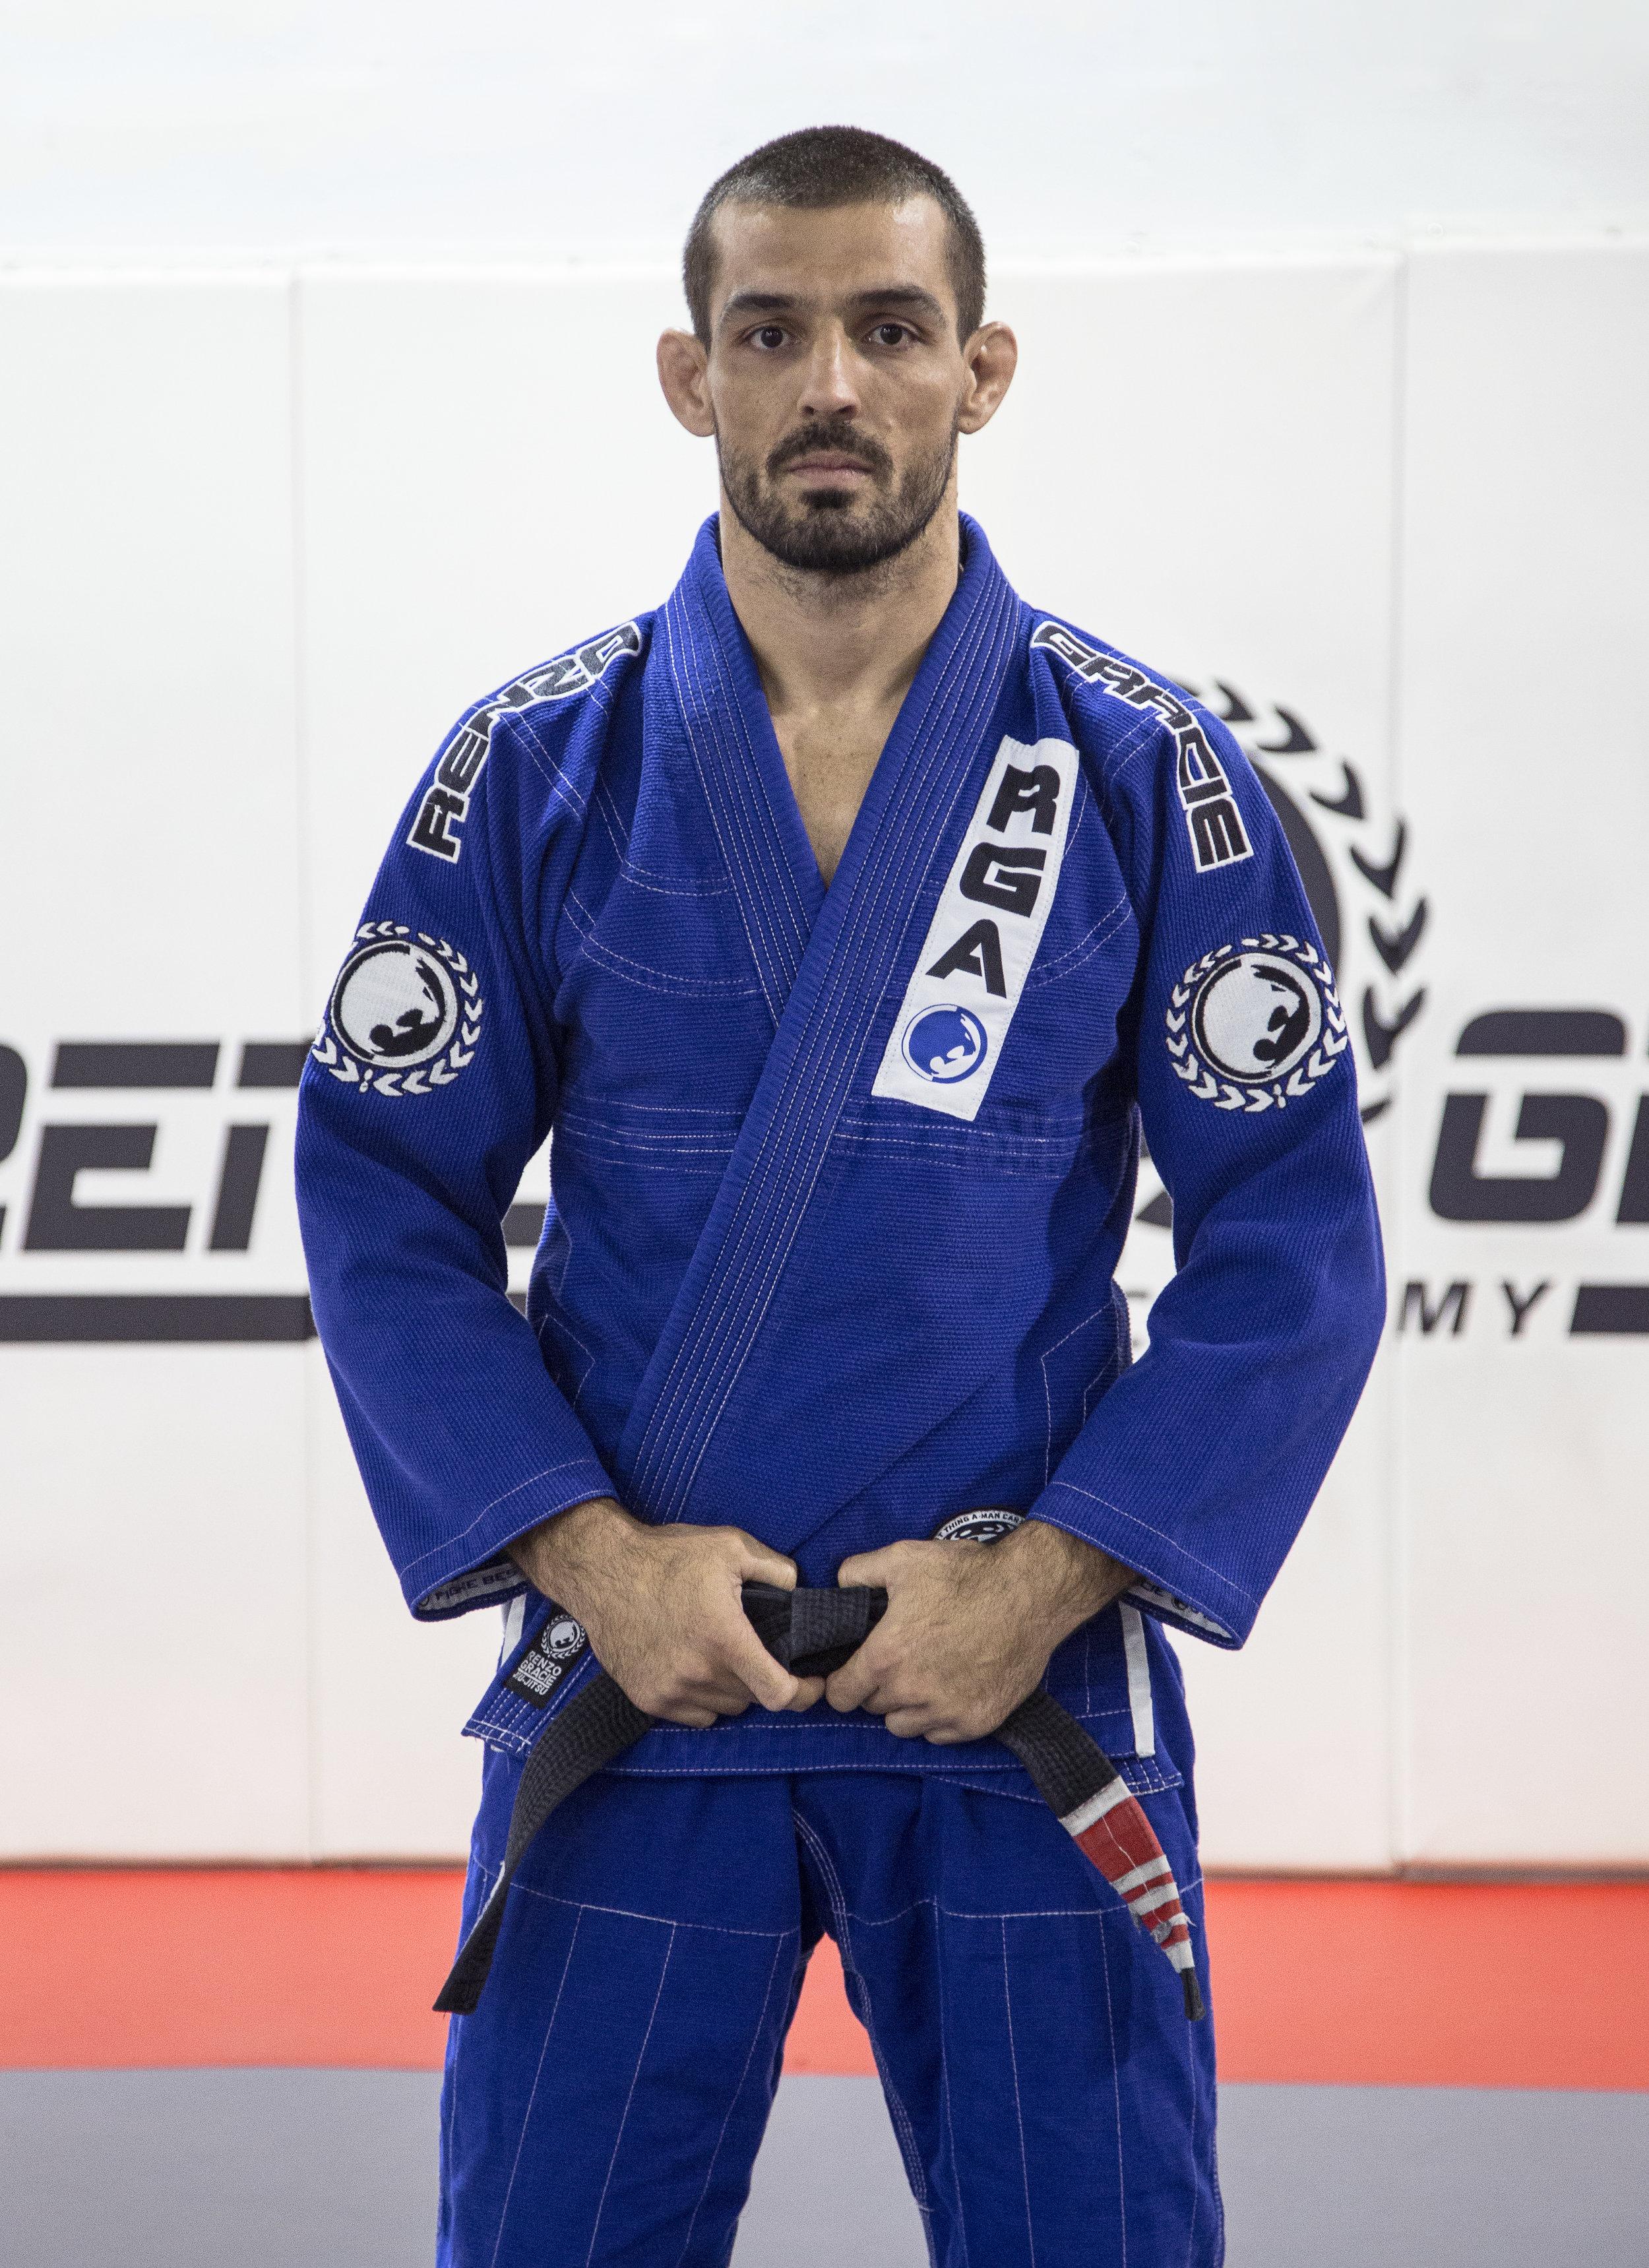 FABIO COELHO   Brazilian Jiu-Jitsu Black Belt